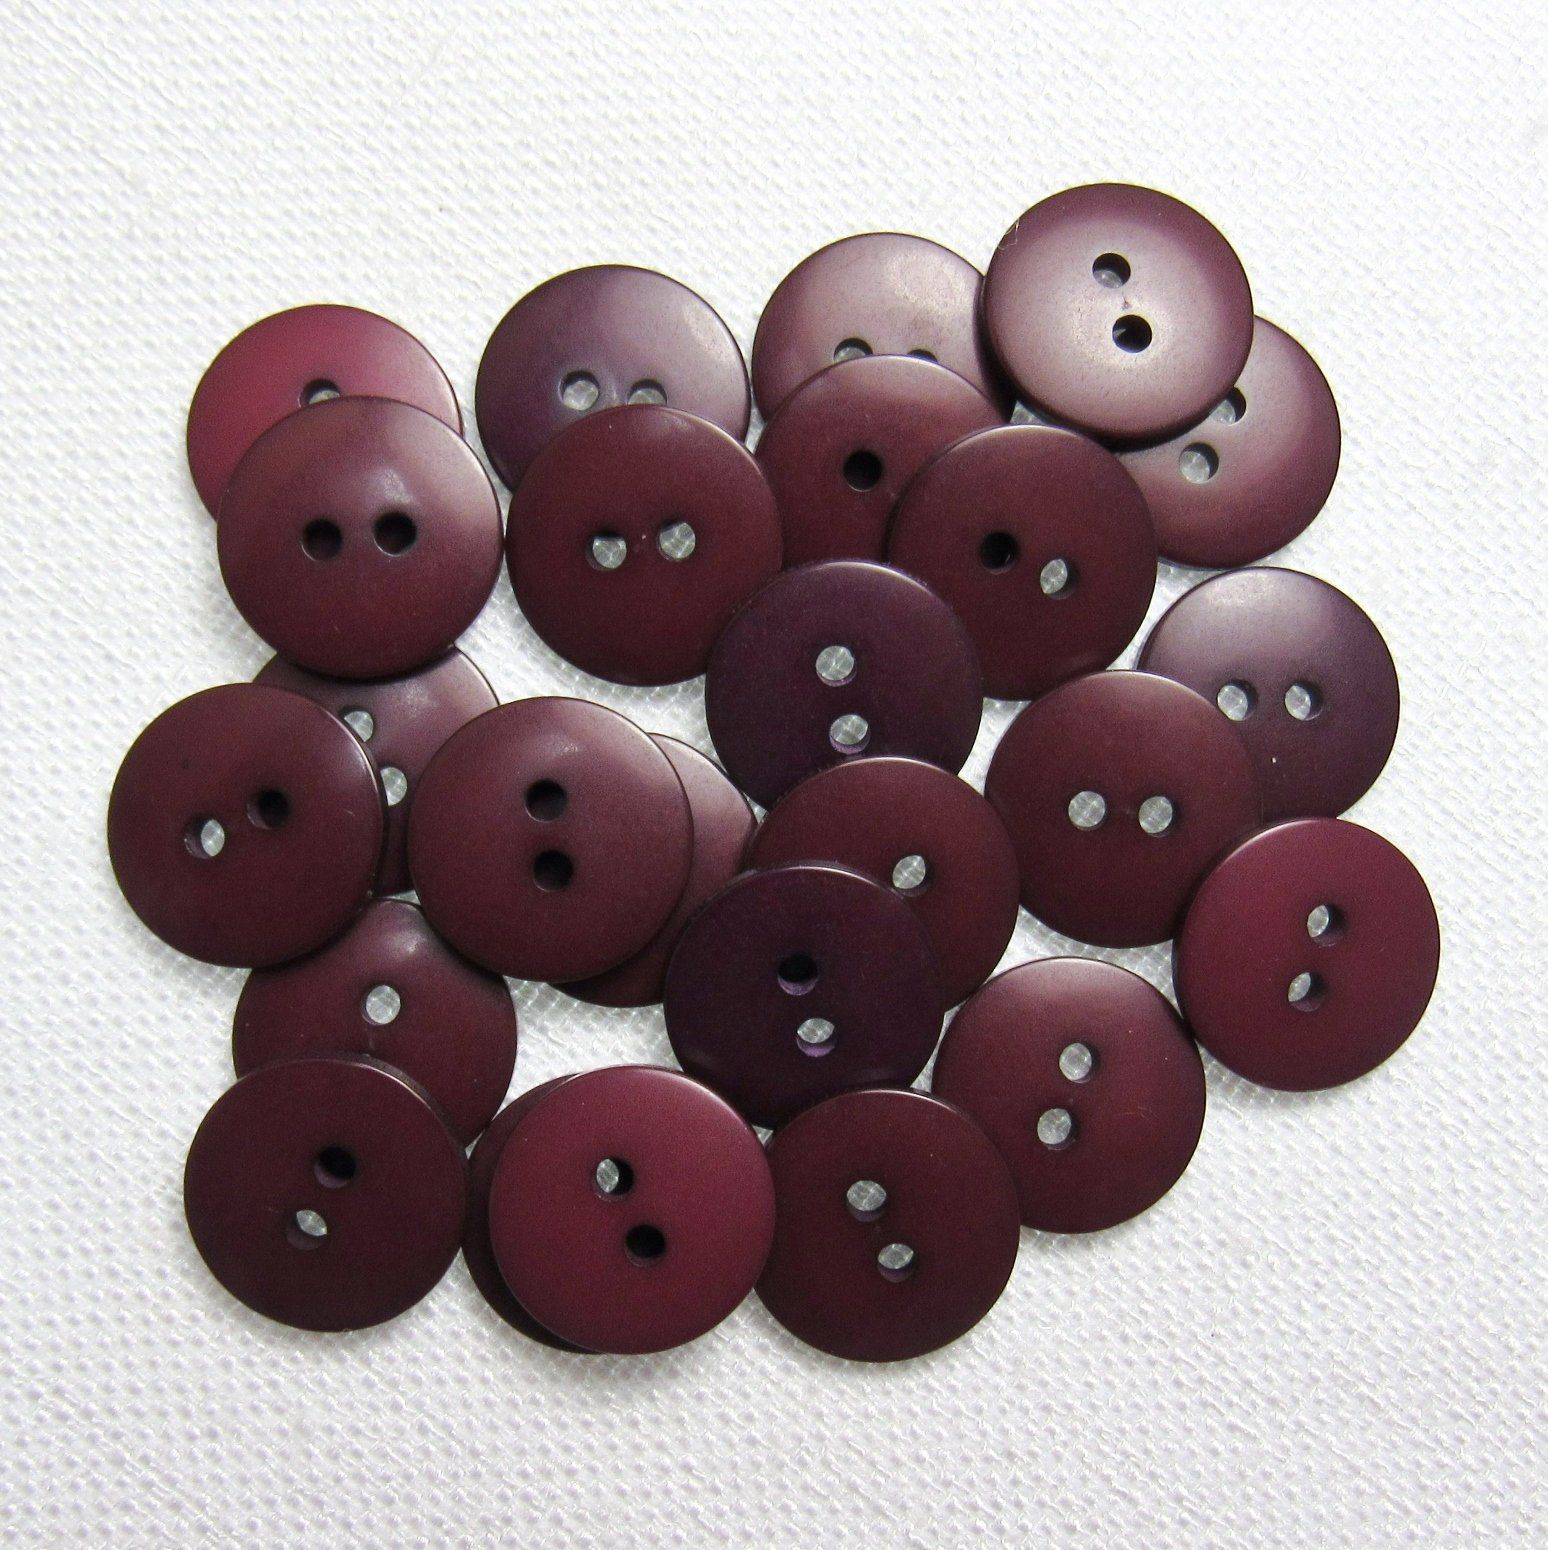 8 x 13mm burgandy  Buttons